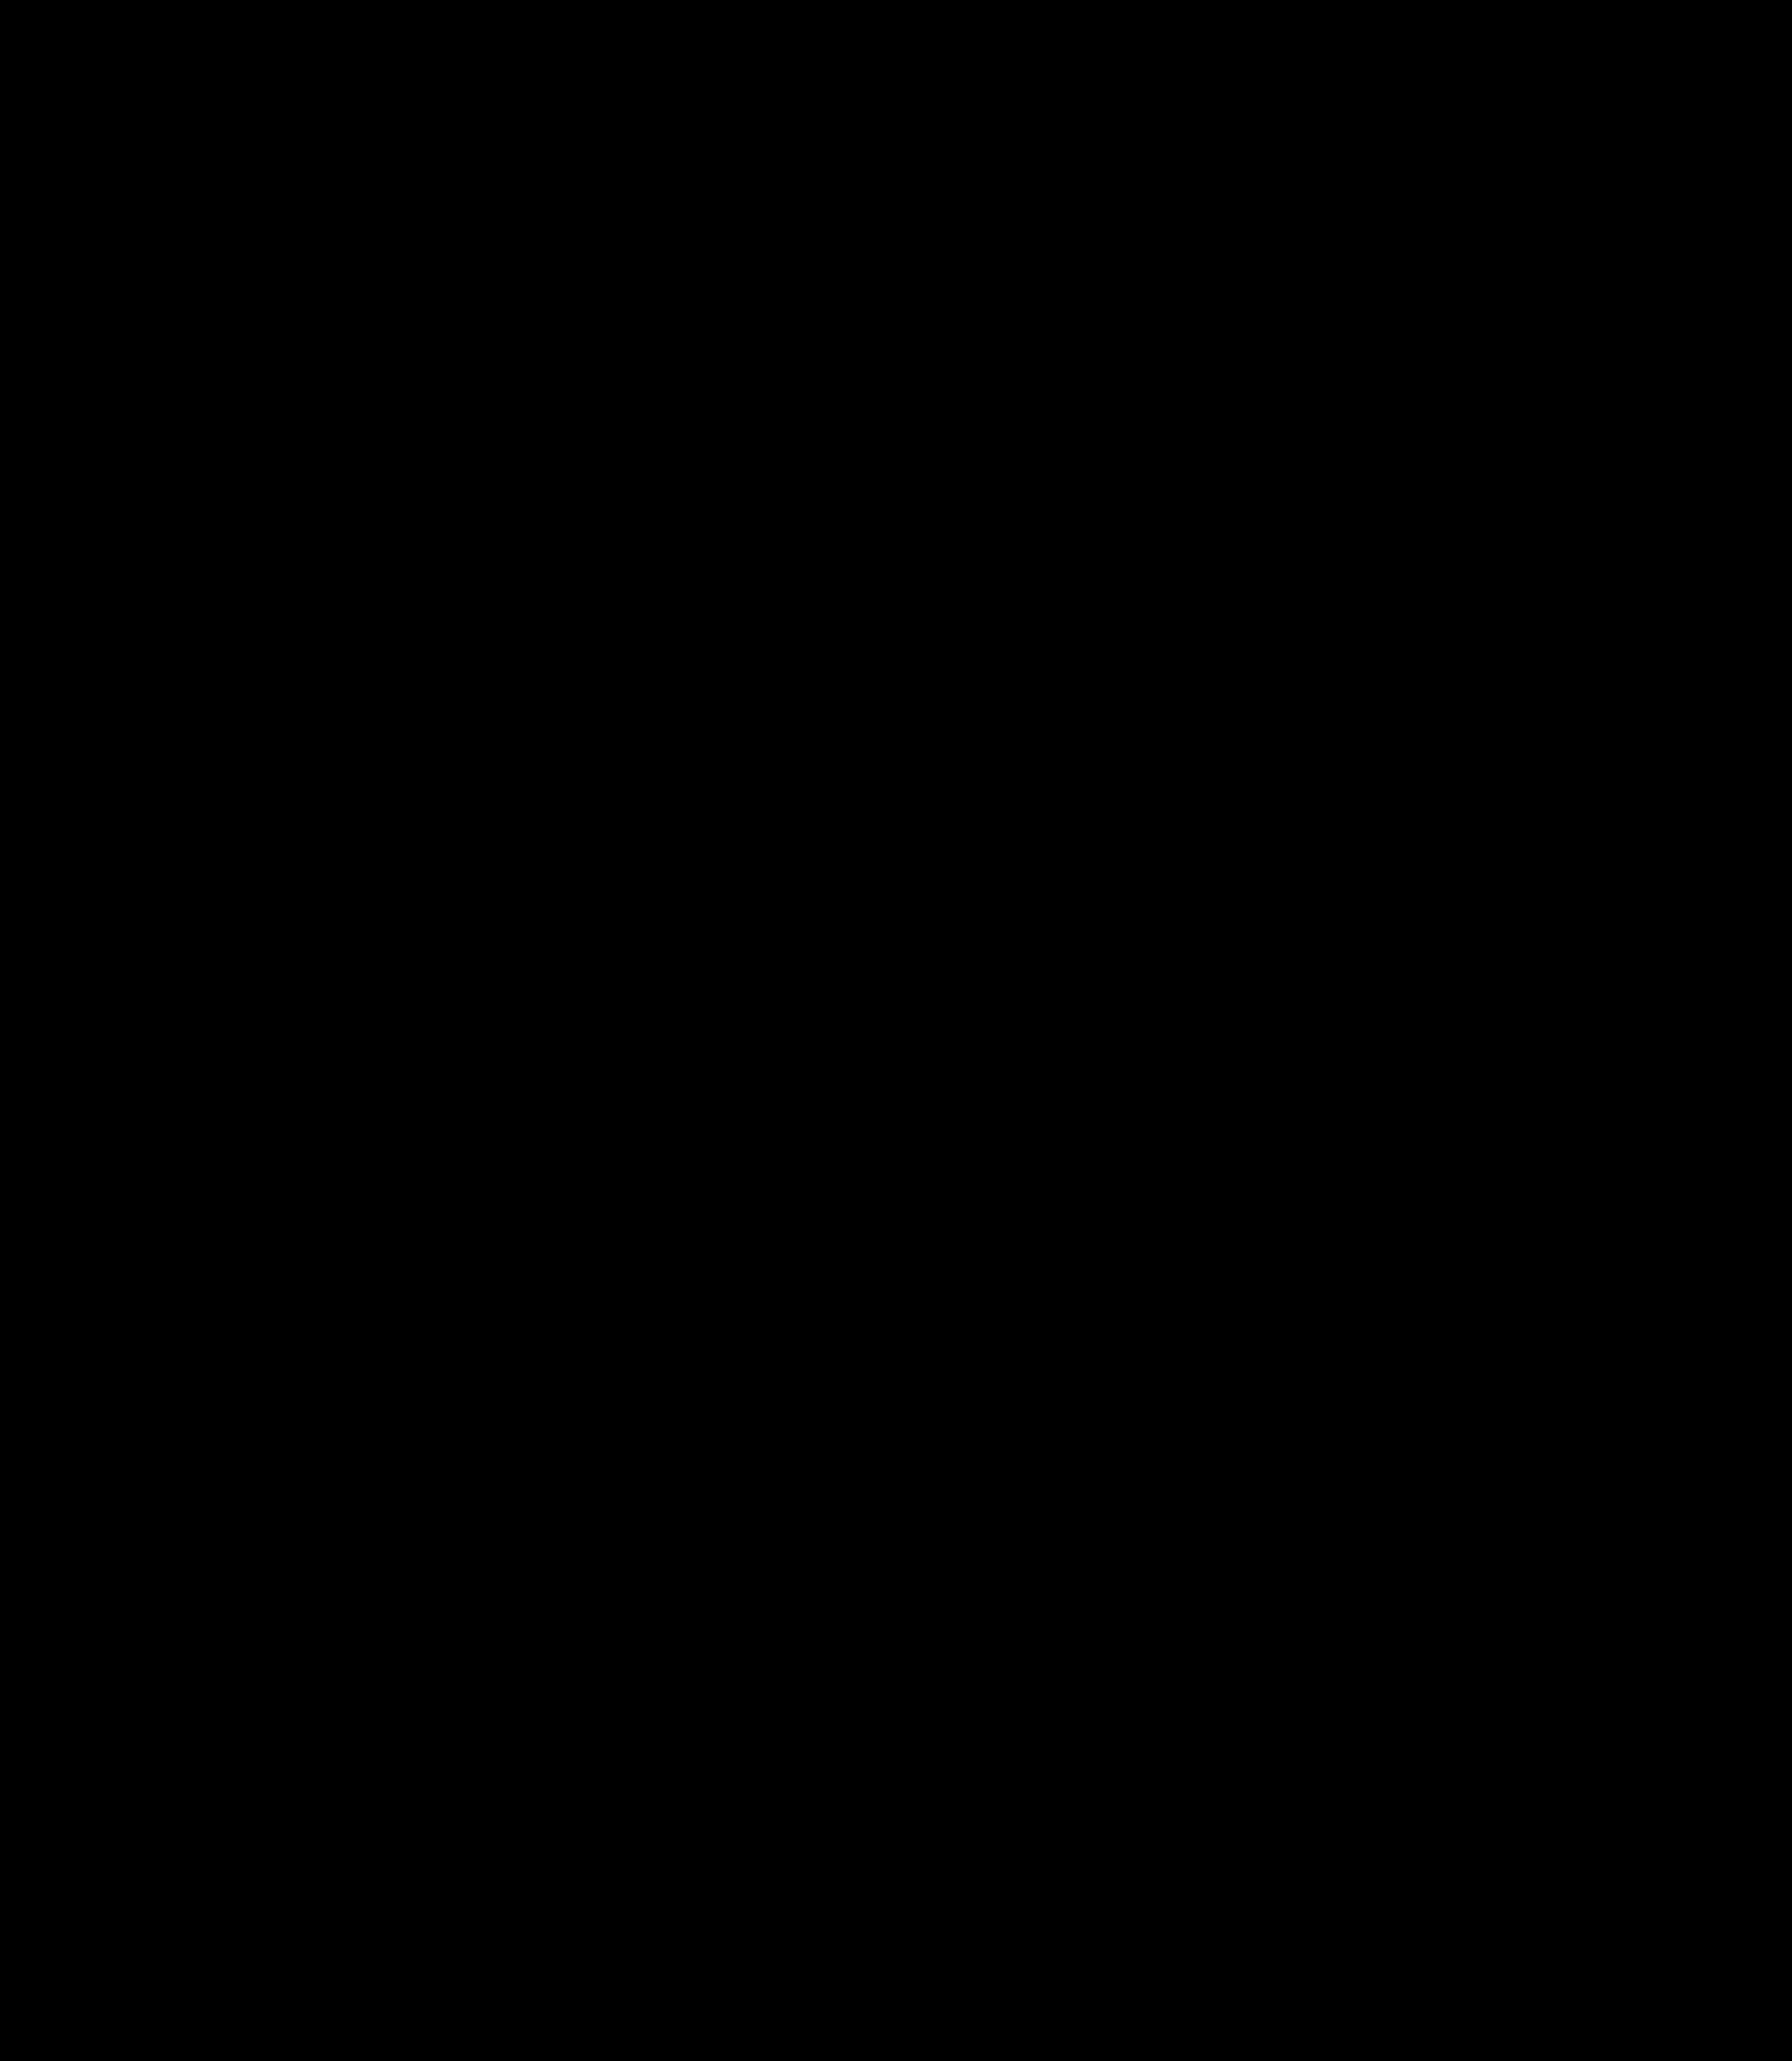 Clipart Swan 2